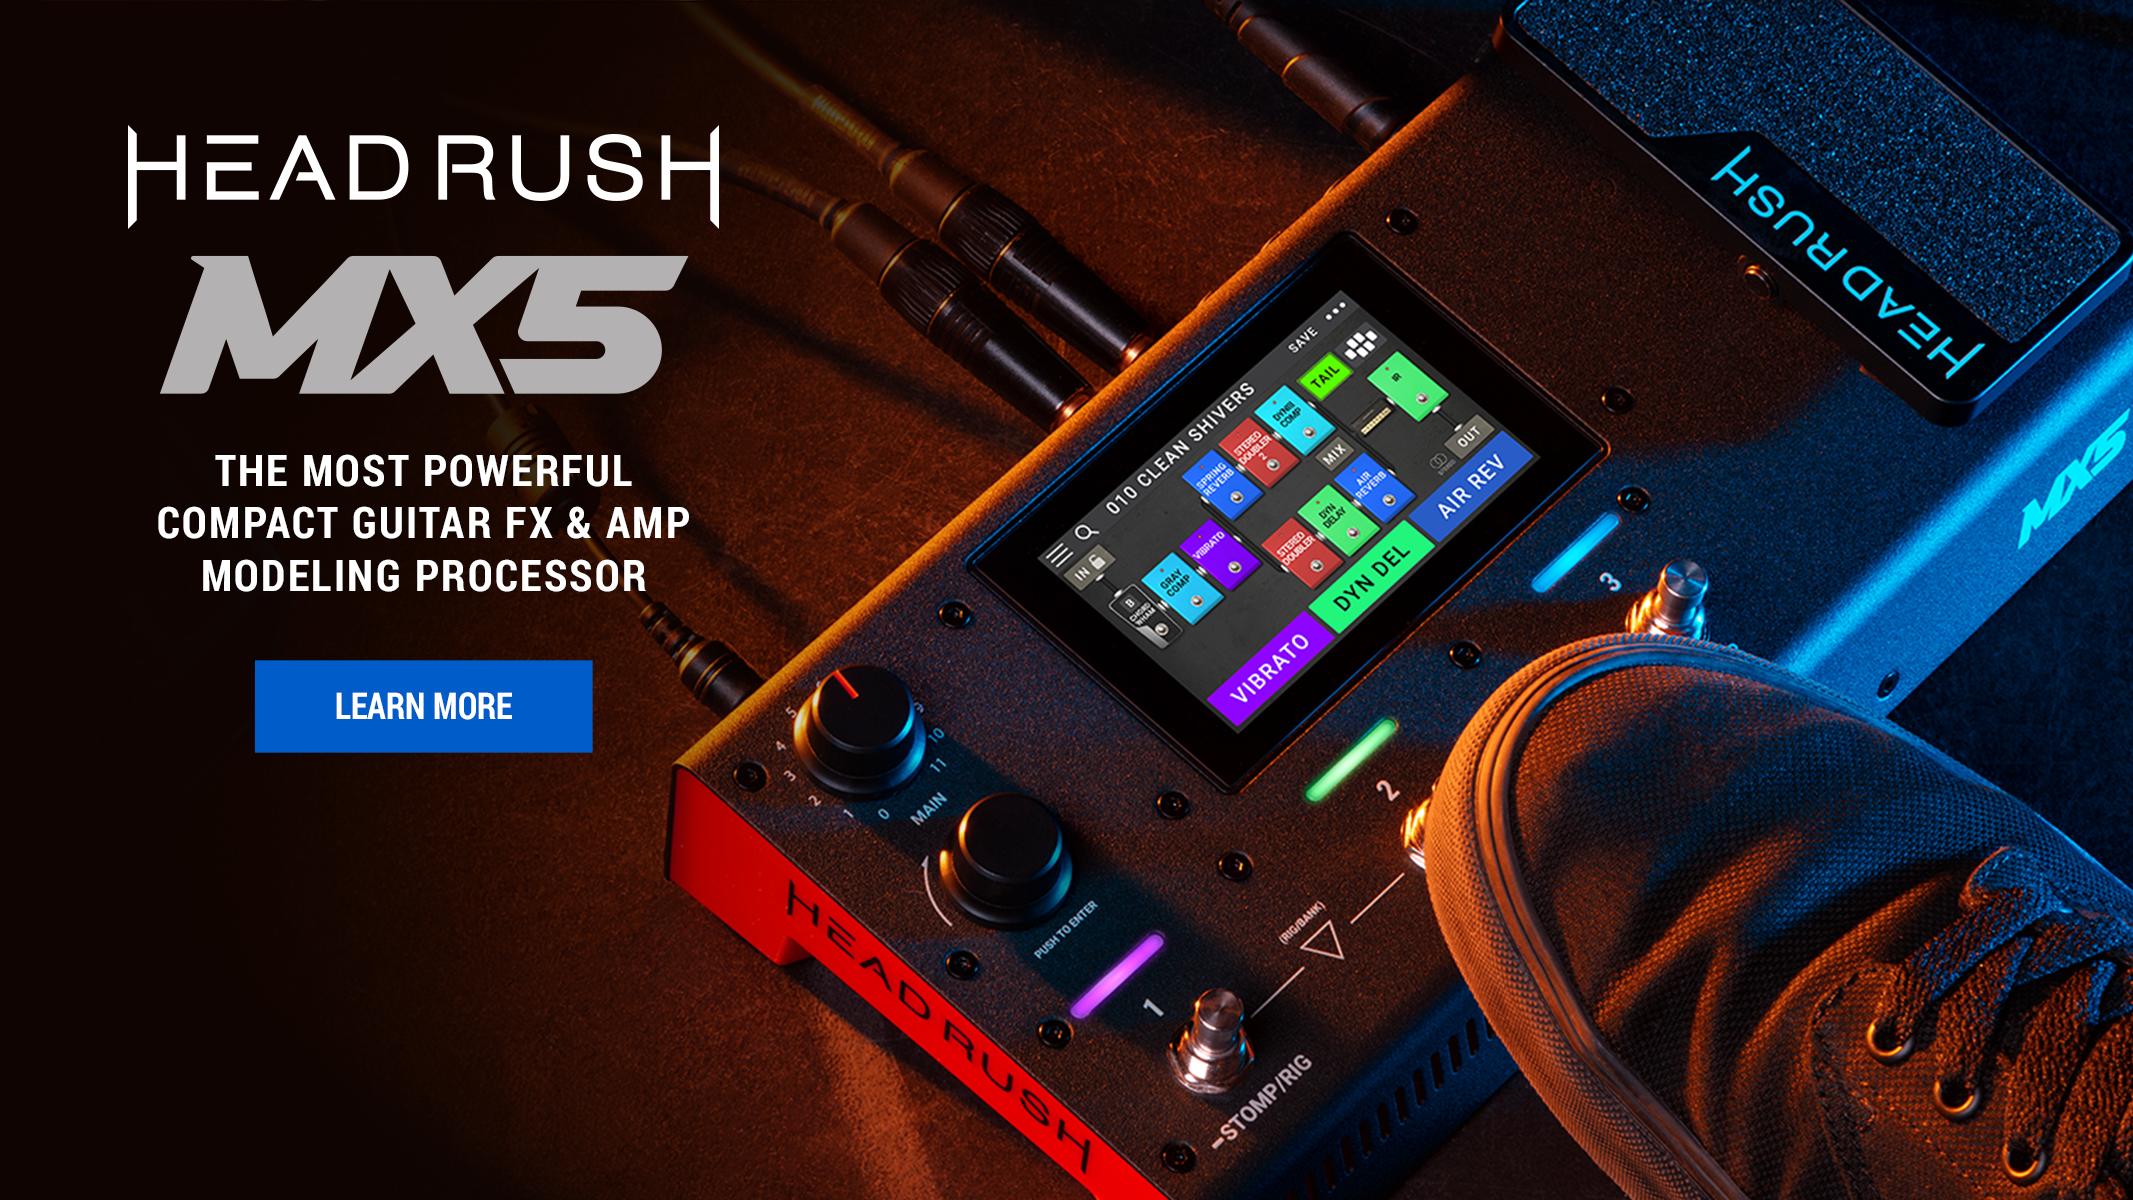 HeadRush MX5